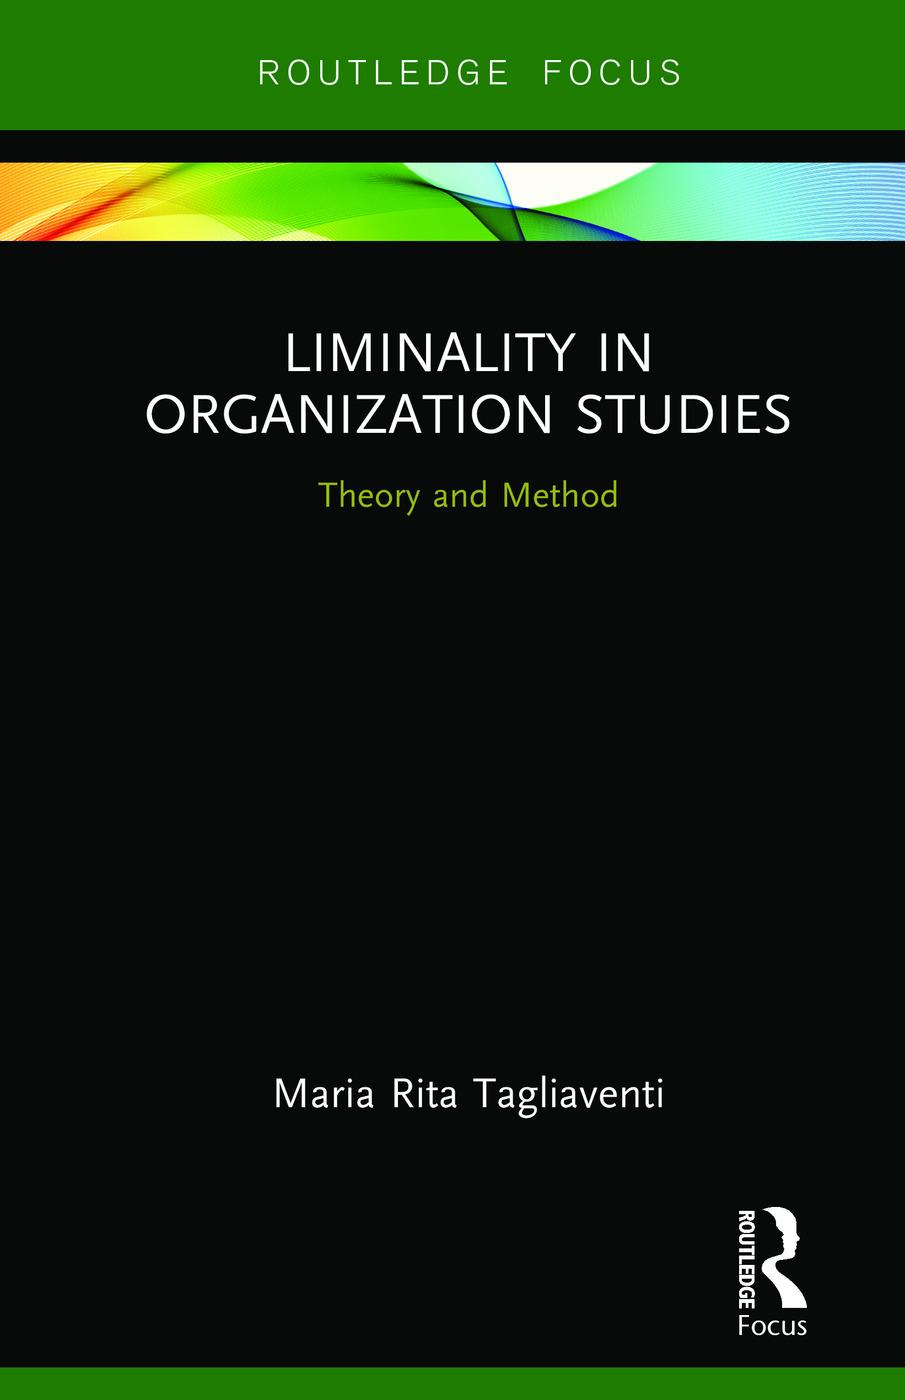 Liminality in Organization Studies